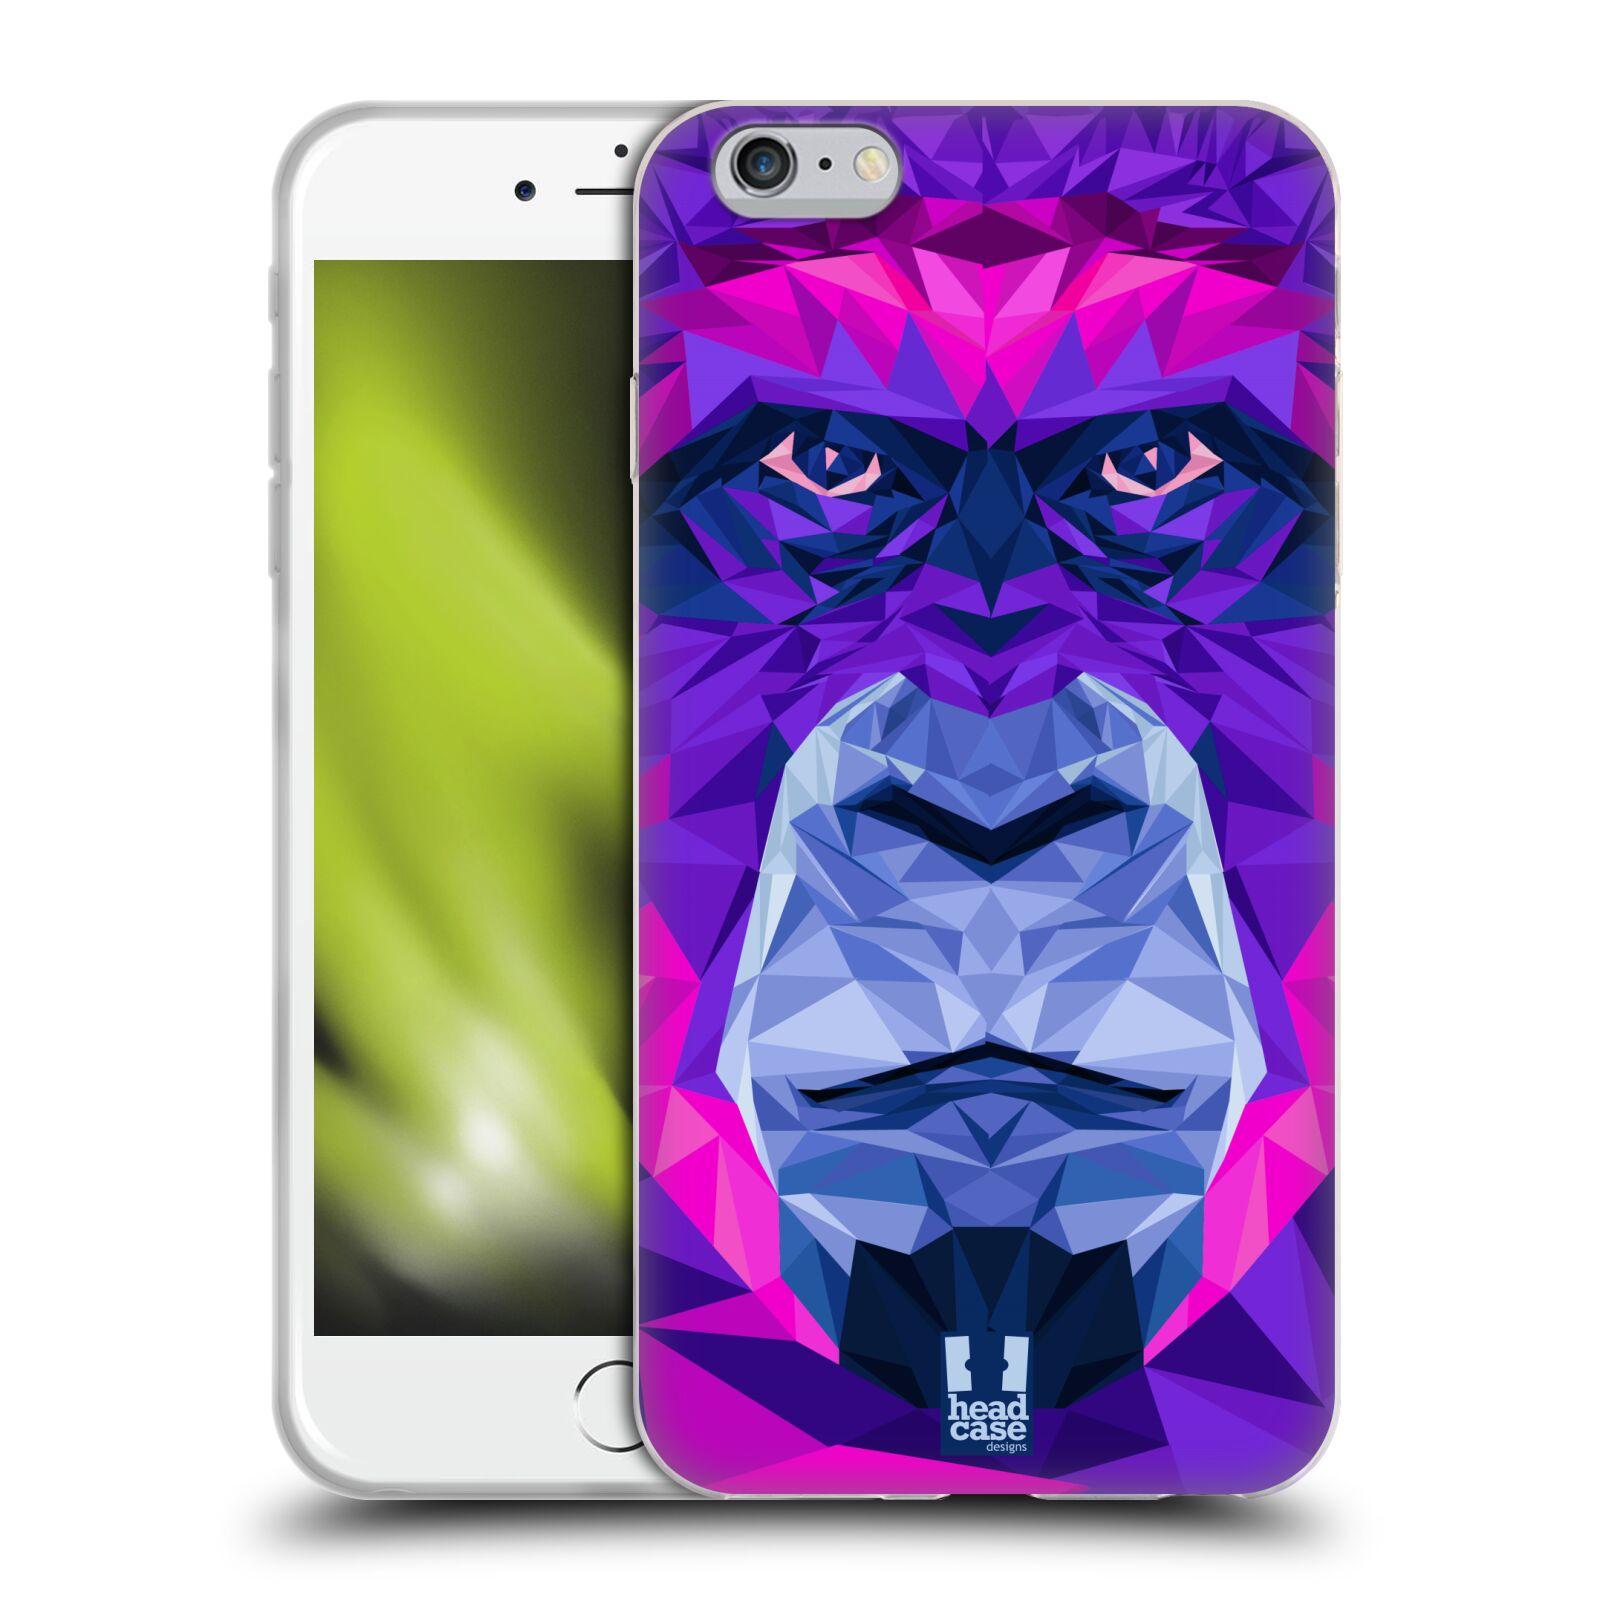 HEAD CASE silikonový obal na mobil Apple Iphone 6 PLUS/ 6S PLUS vzor Geometrická zvířata 2 Orangutan